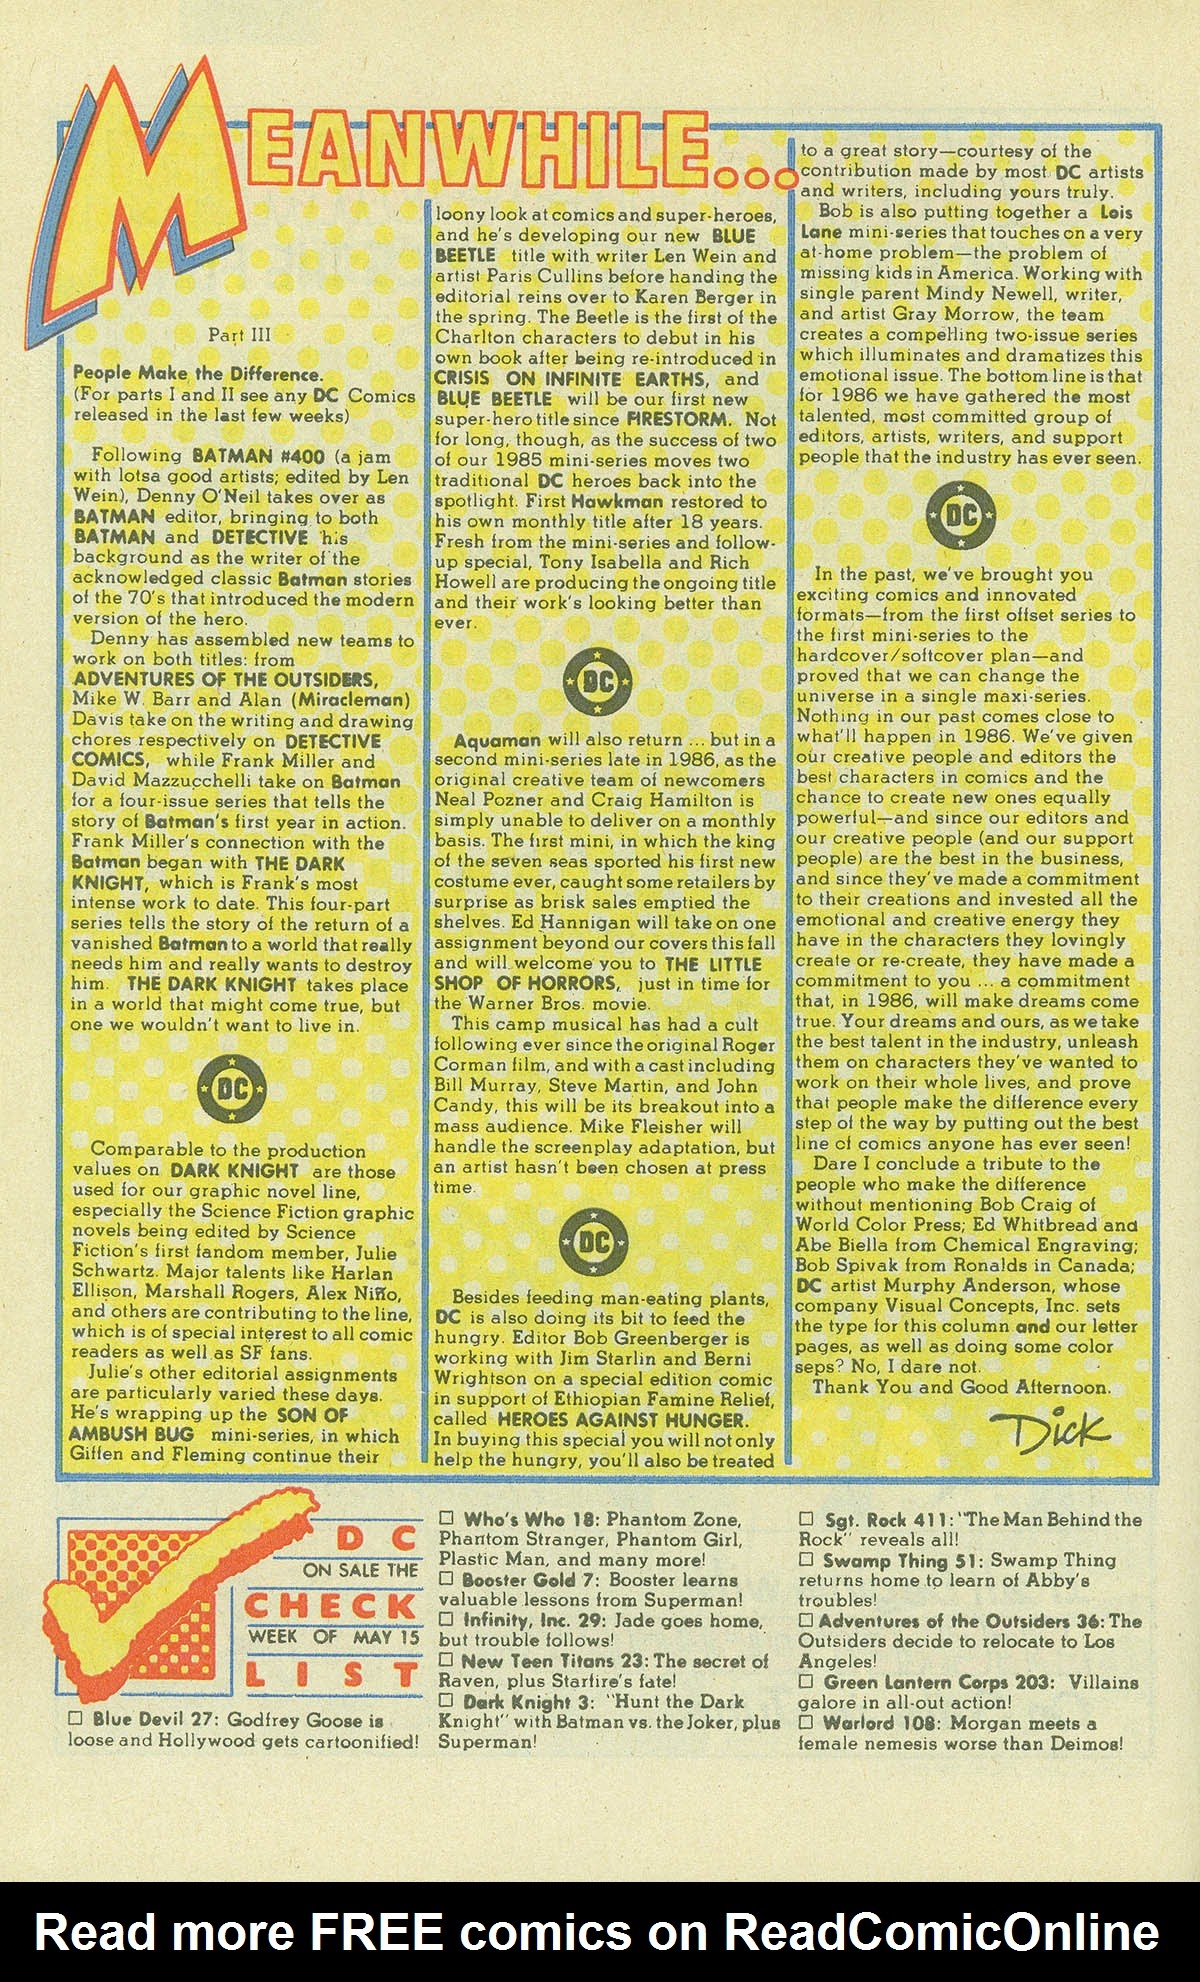 Read online Sgt. Rock comic -  Issue #411 - 29